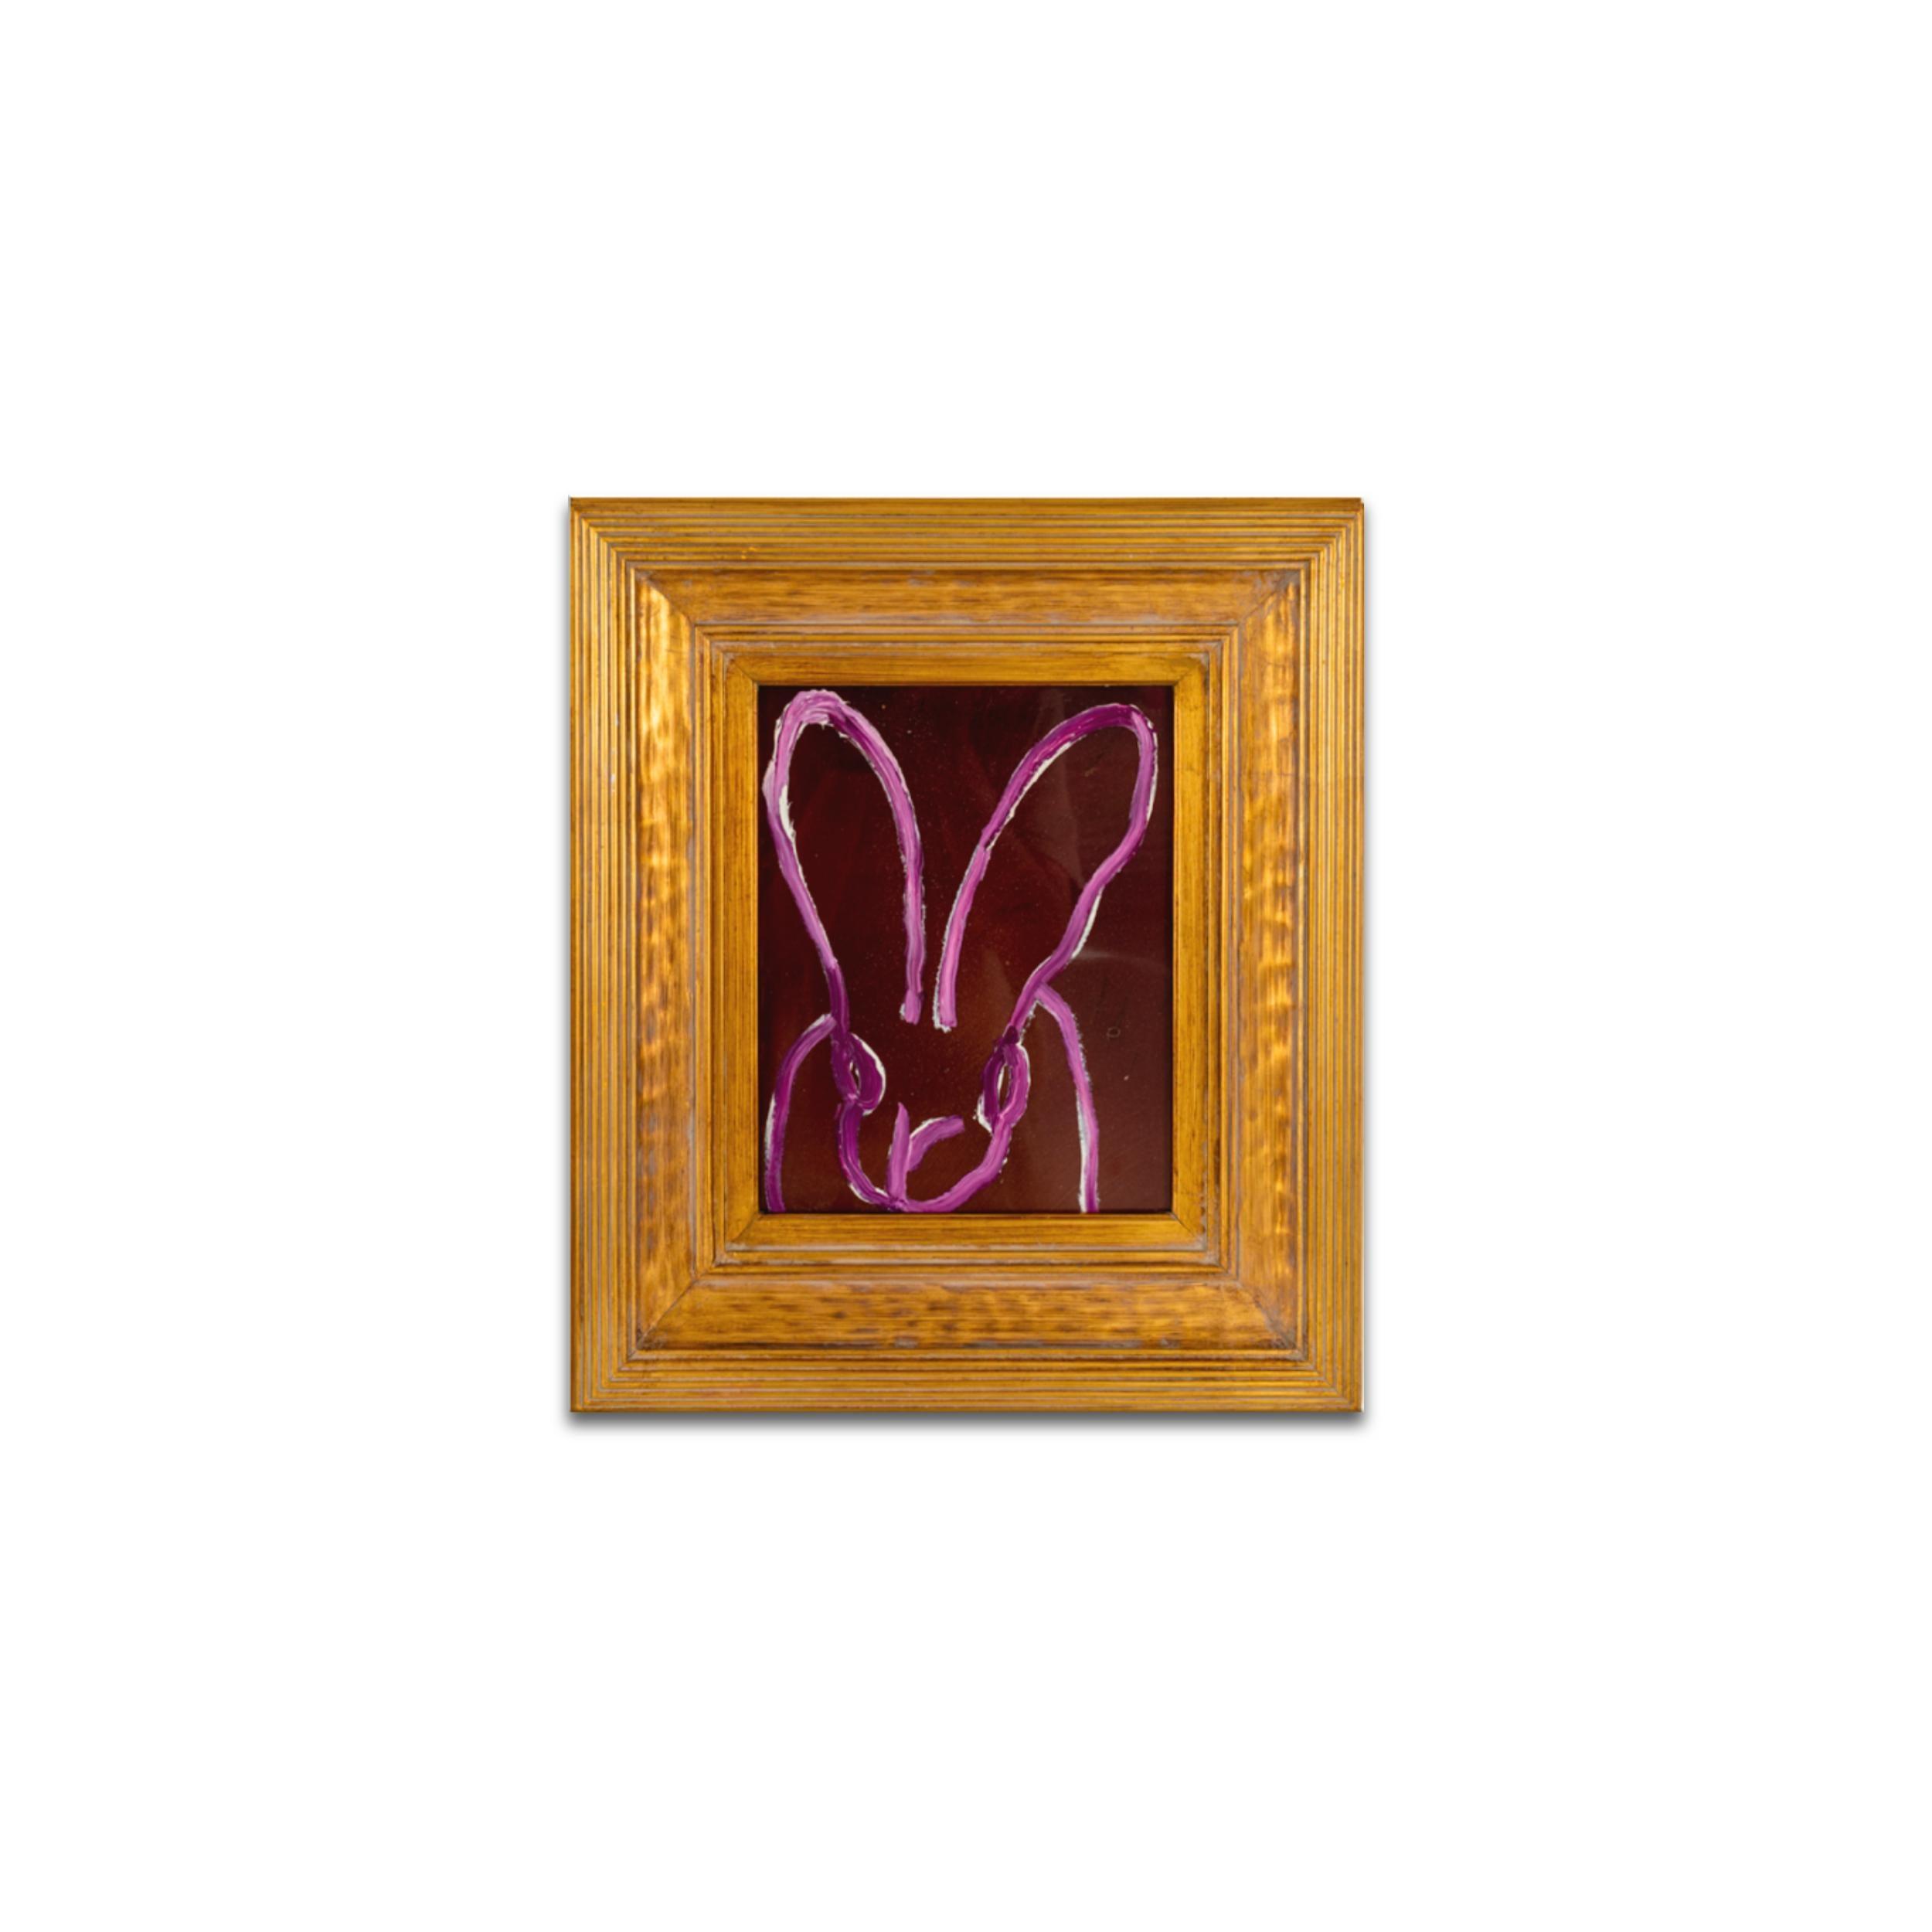 UNTITLED Purple Bunny